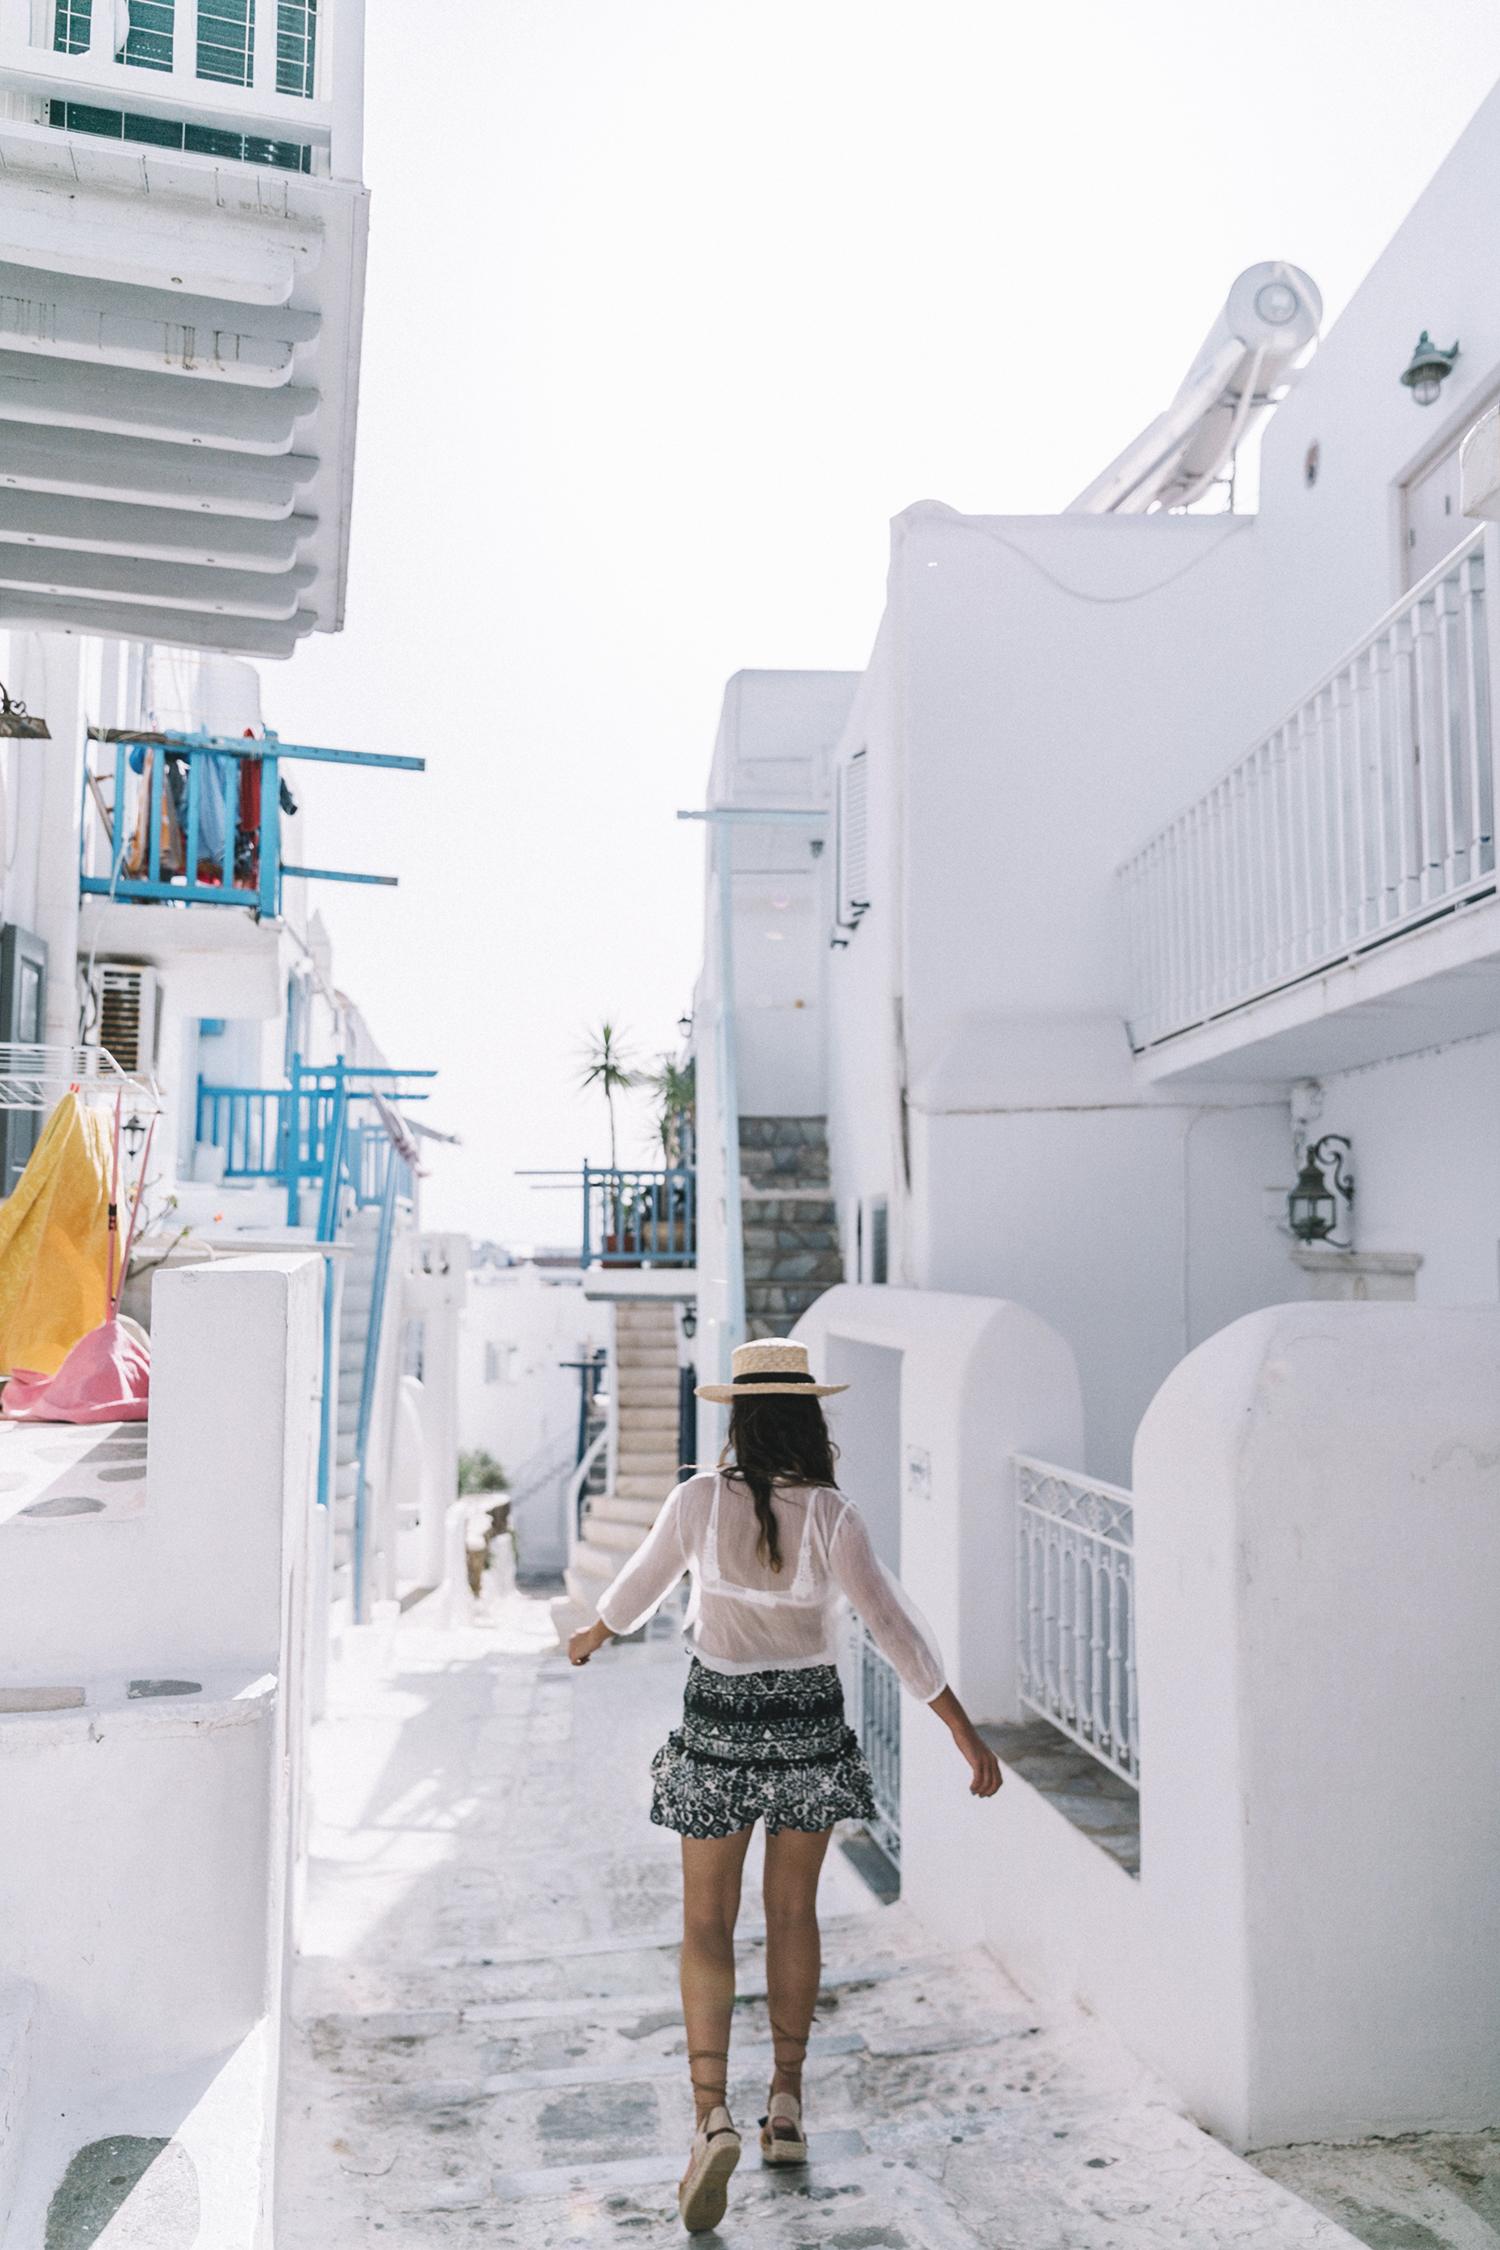 Lace_up_Blouse-Ralph_Lauren-Soludos_Espadrilles-Soludos_Escapes-Skirt-Straw_Hat-Canotier-Lack_Of_Color-Street_Style-Mykonos-Greece-Collage_Vintage-61